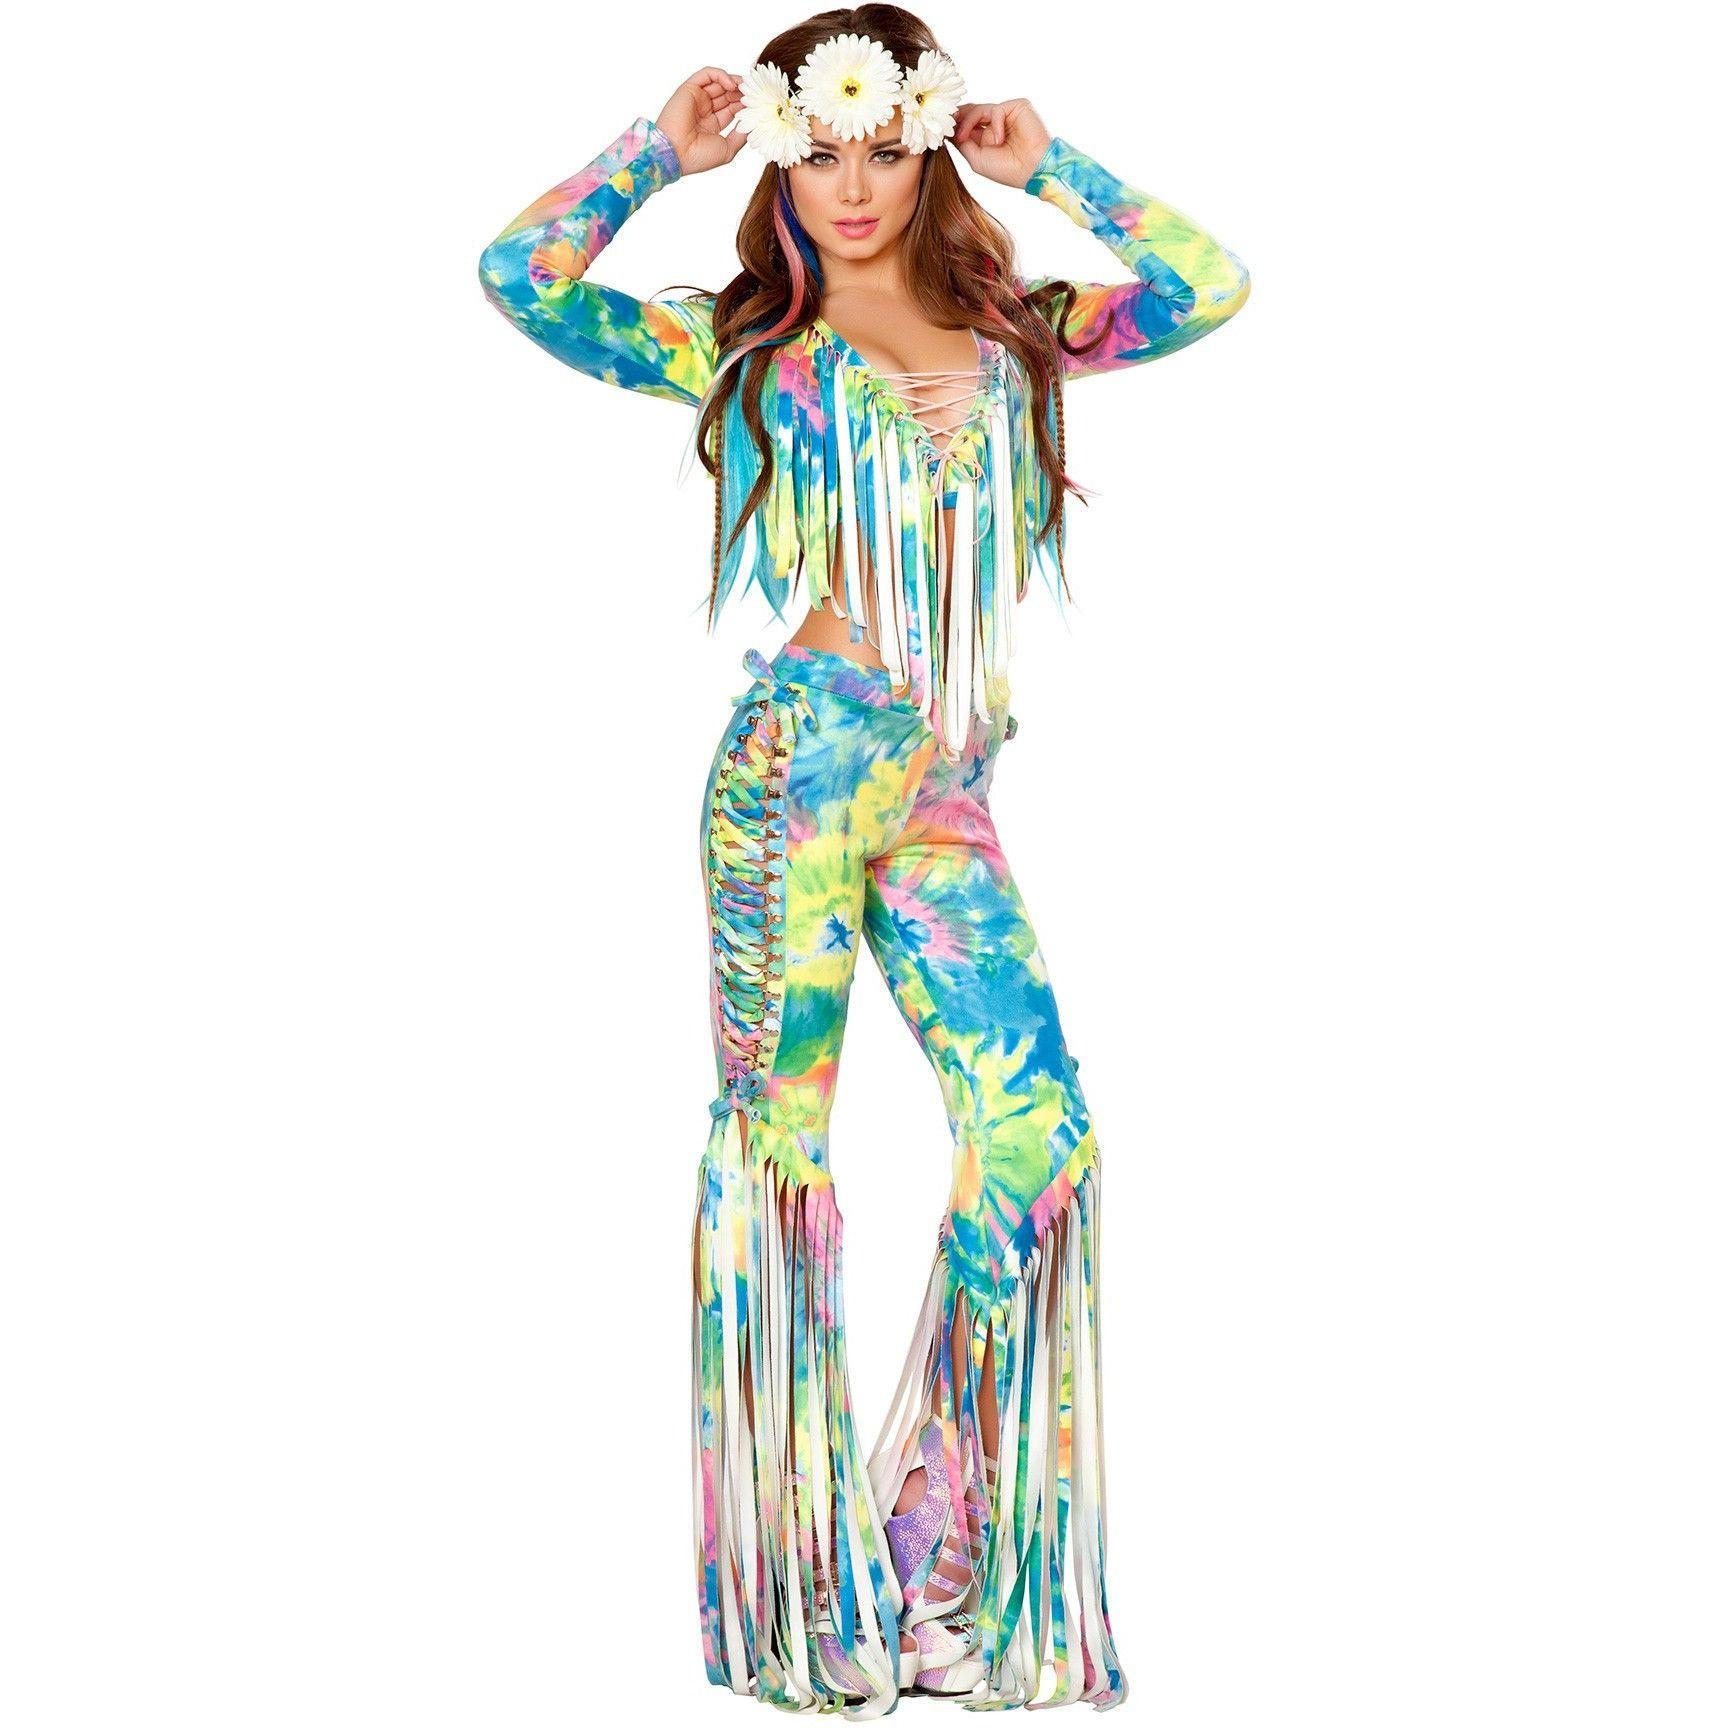 tie dye fringe outfit rave festival trippy plur